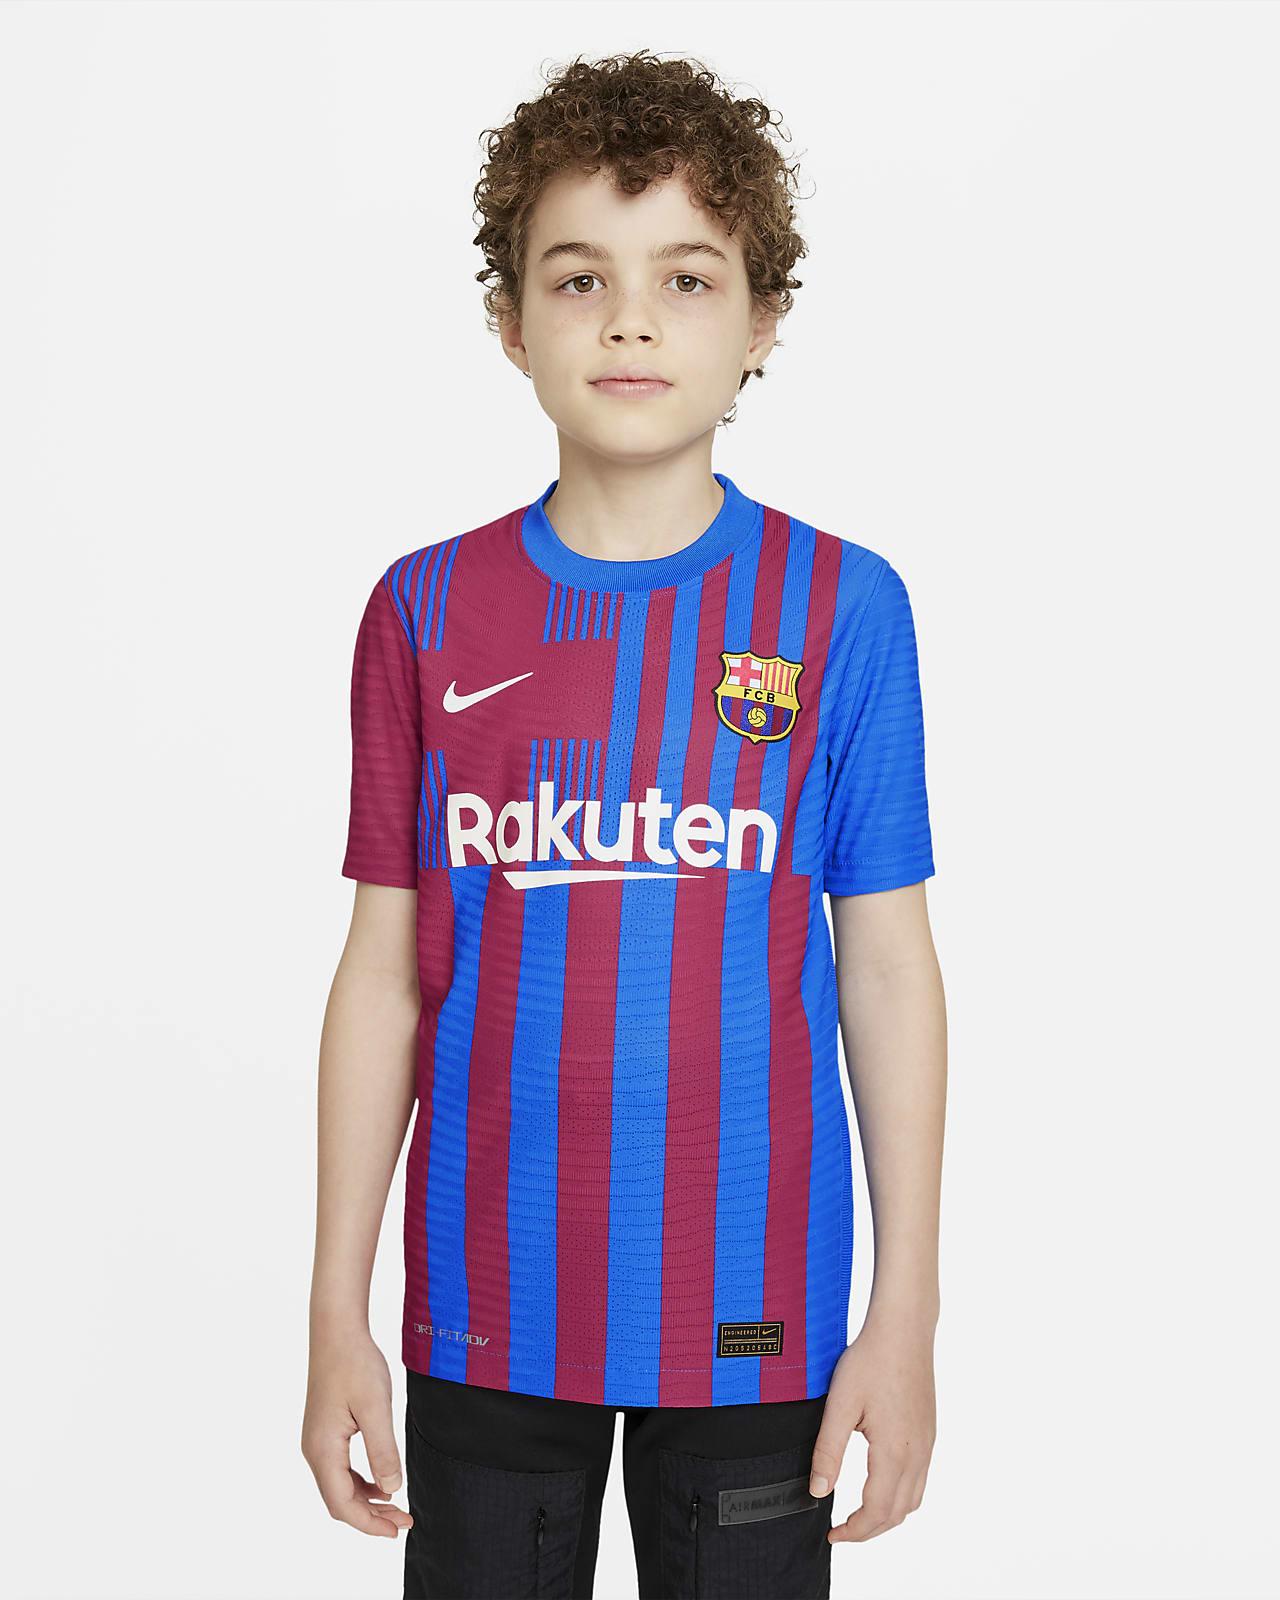 F.C. Barcelona 2021/22 Match Home Older Kids' Nike Dri-FIT ADV Football Shirt